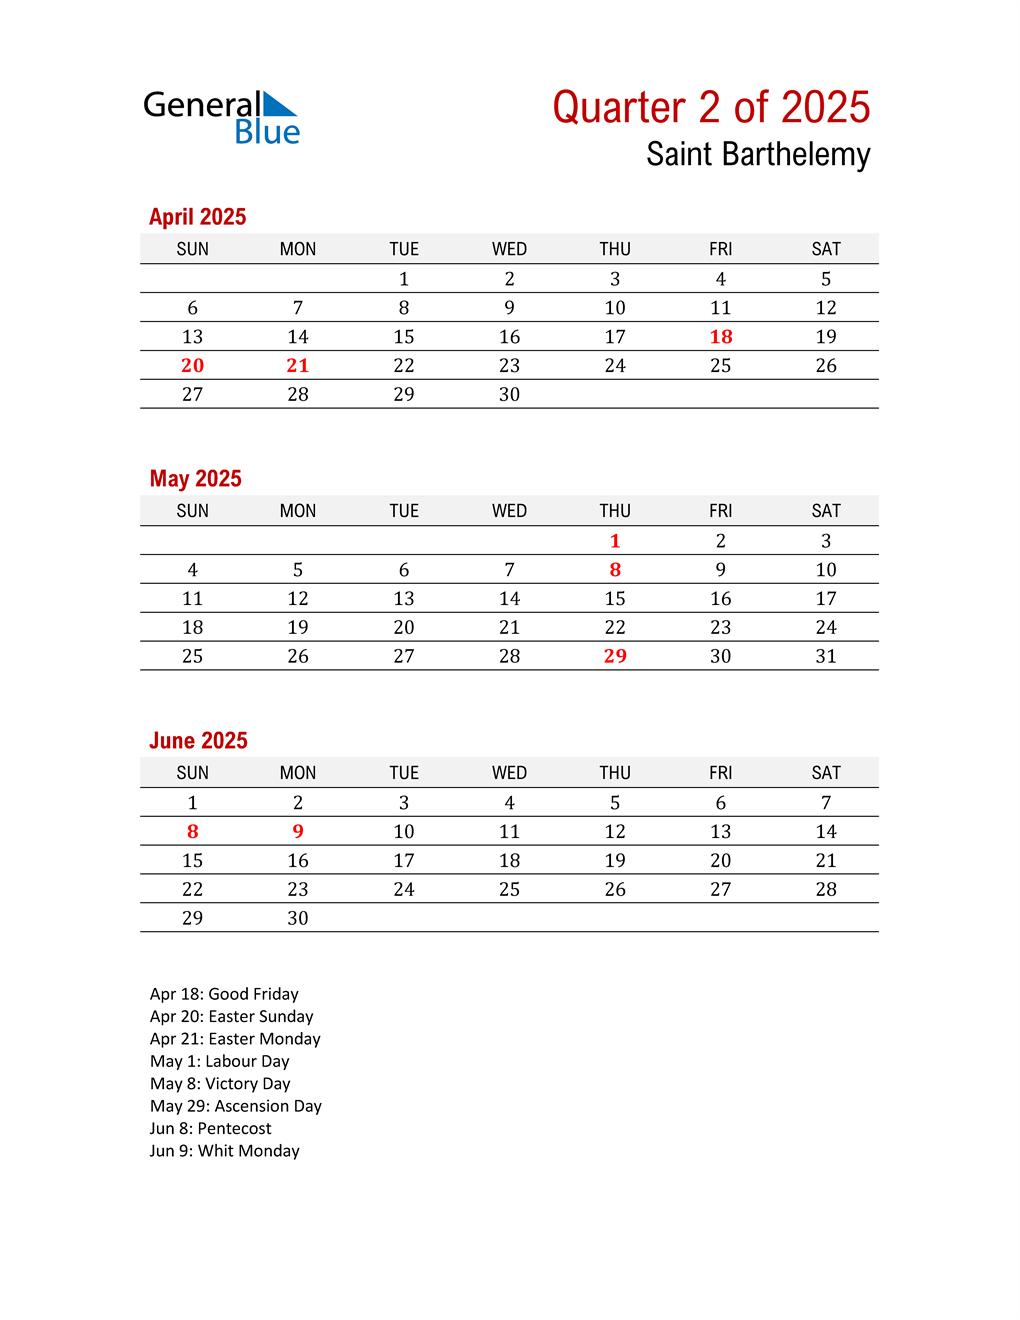 Printable Three Month Calendar for Saint Barthelemy